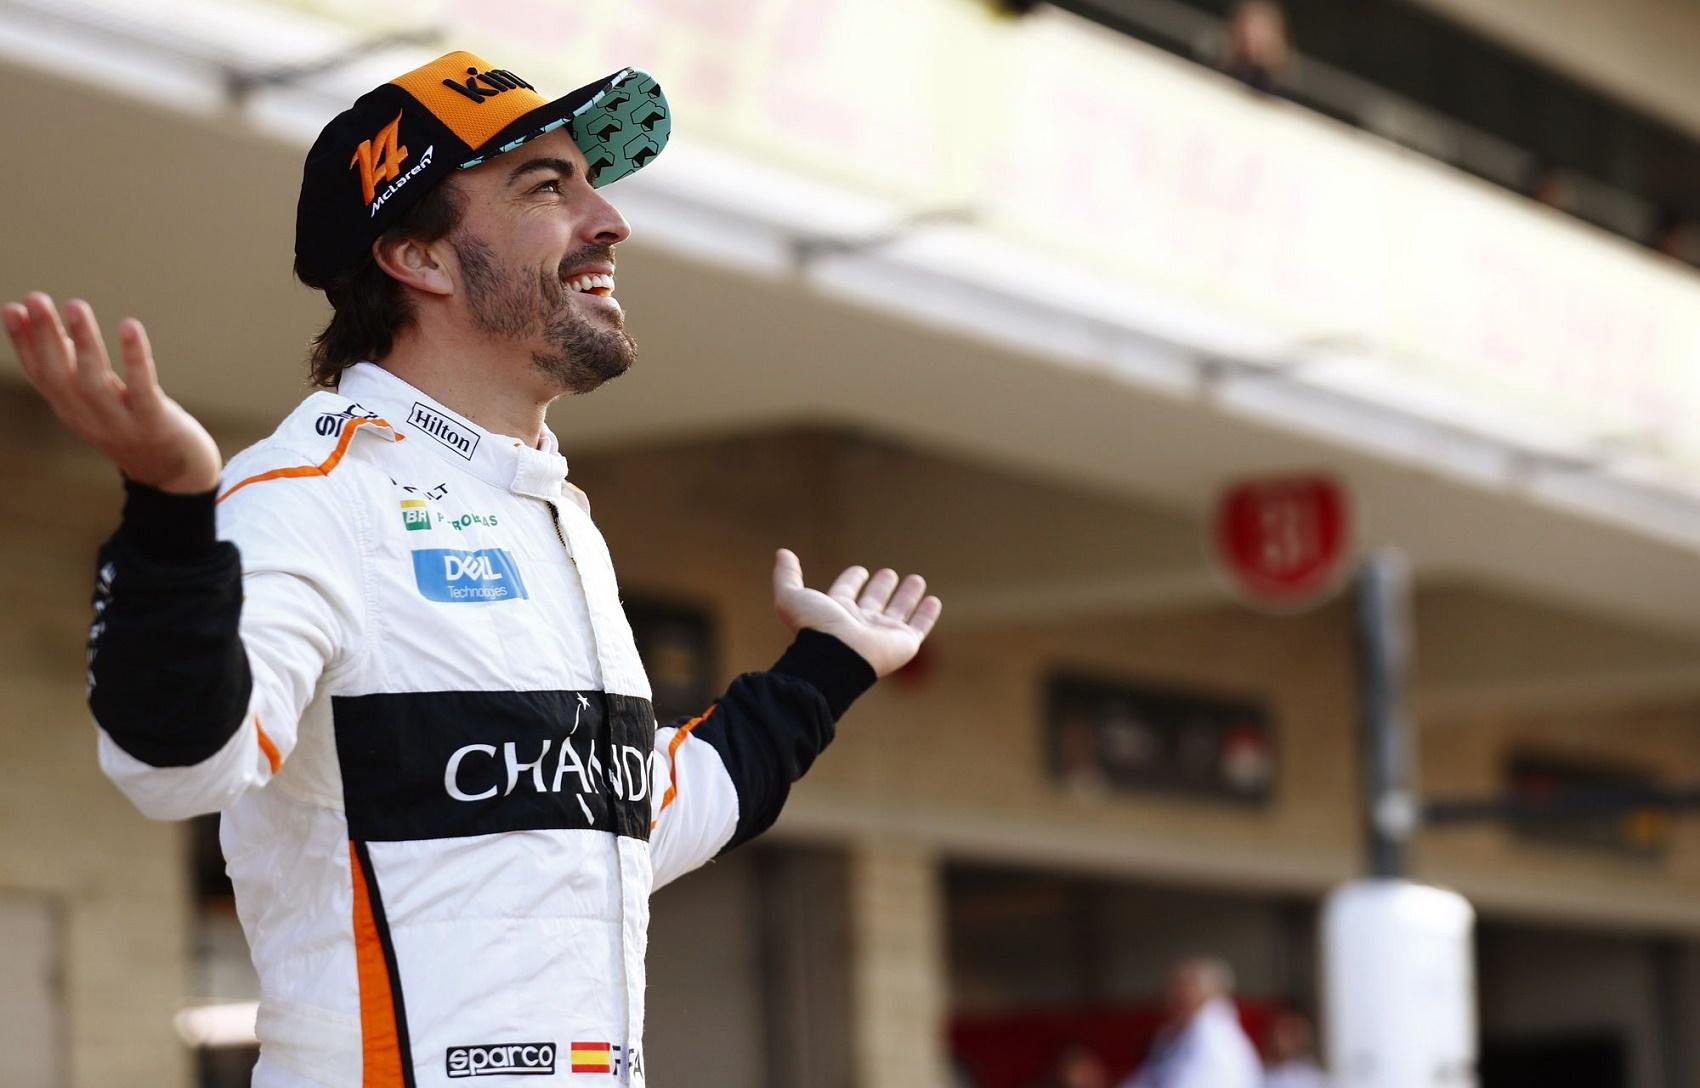 Fernando Alonso, racingline, racinglinehu, racingline.hu